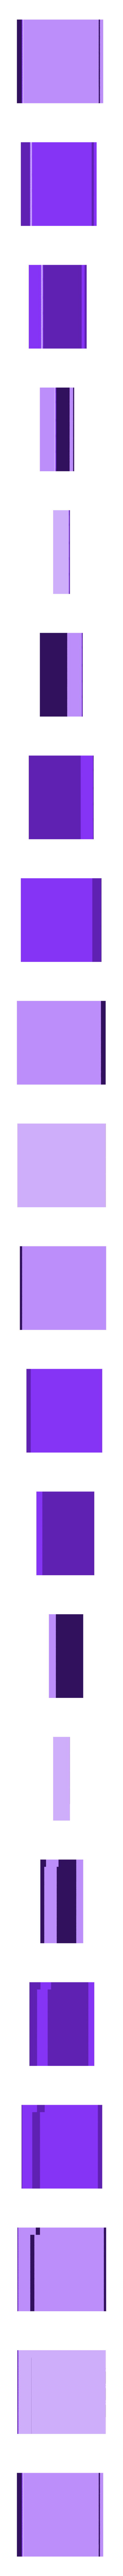 Door04f2.stl Download free STL file Cat Flap Automatic Door • 3D printing model, Edd77